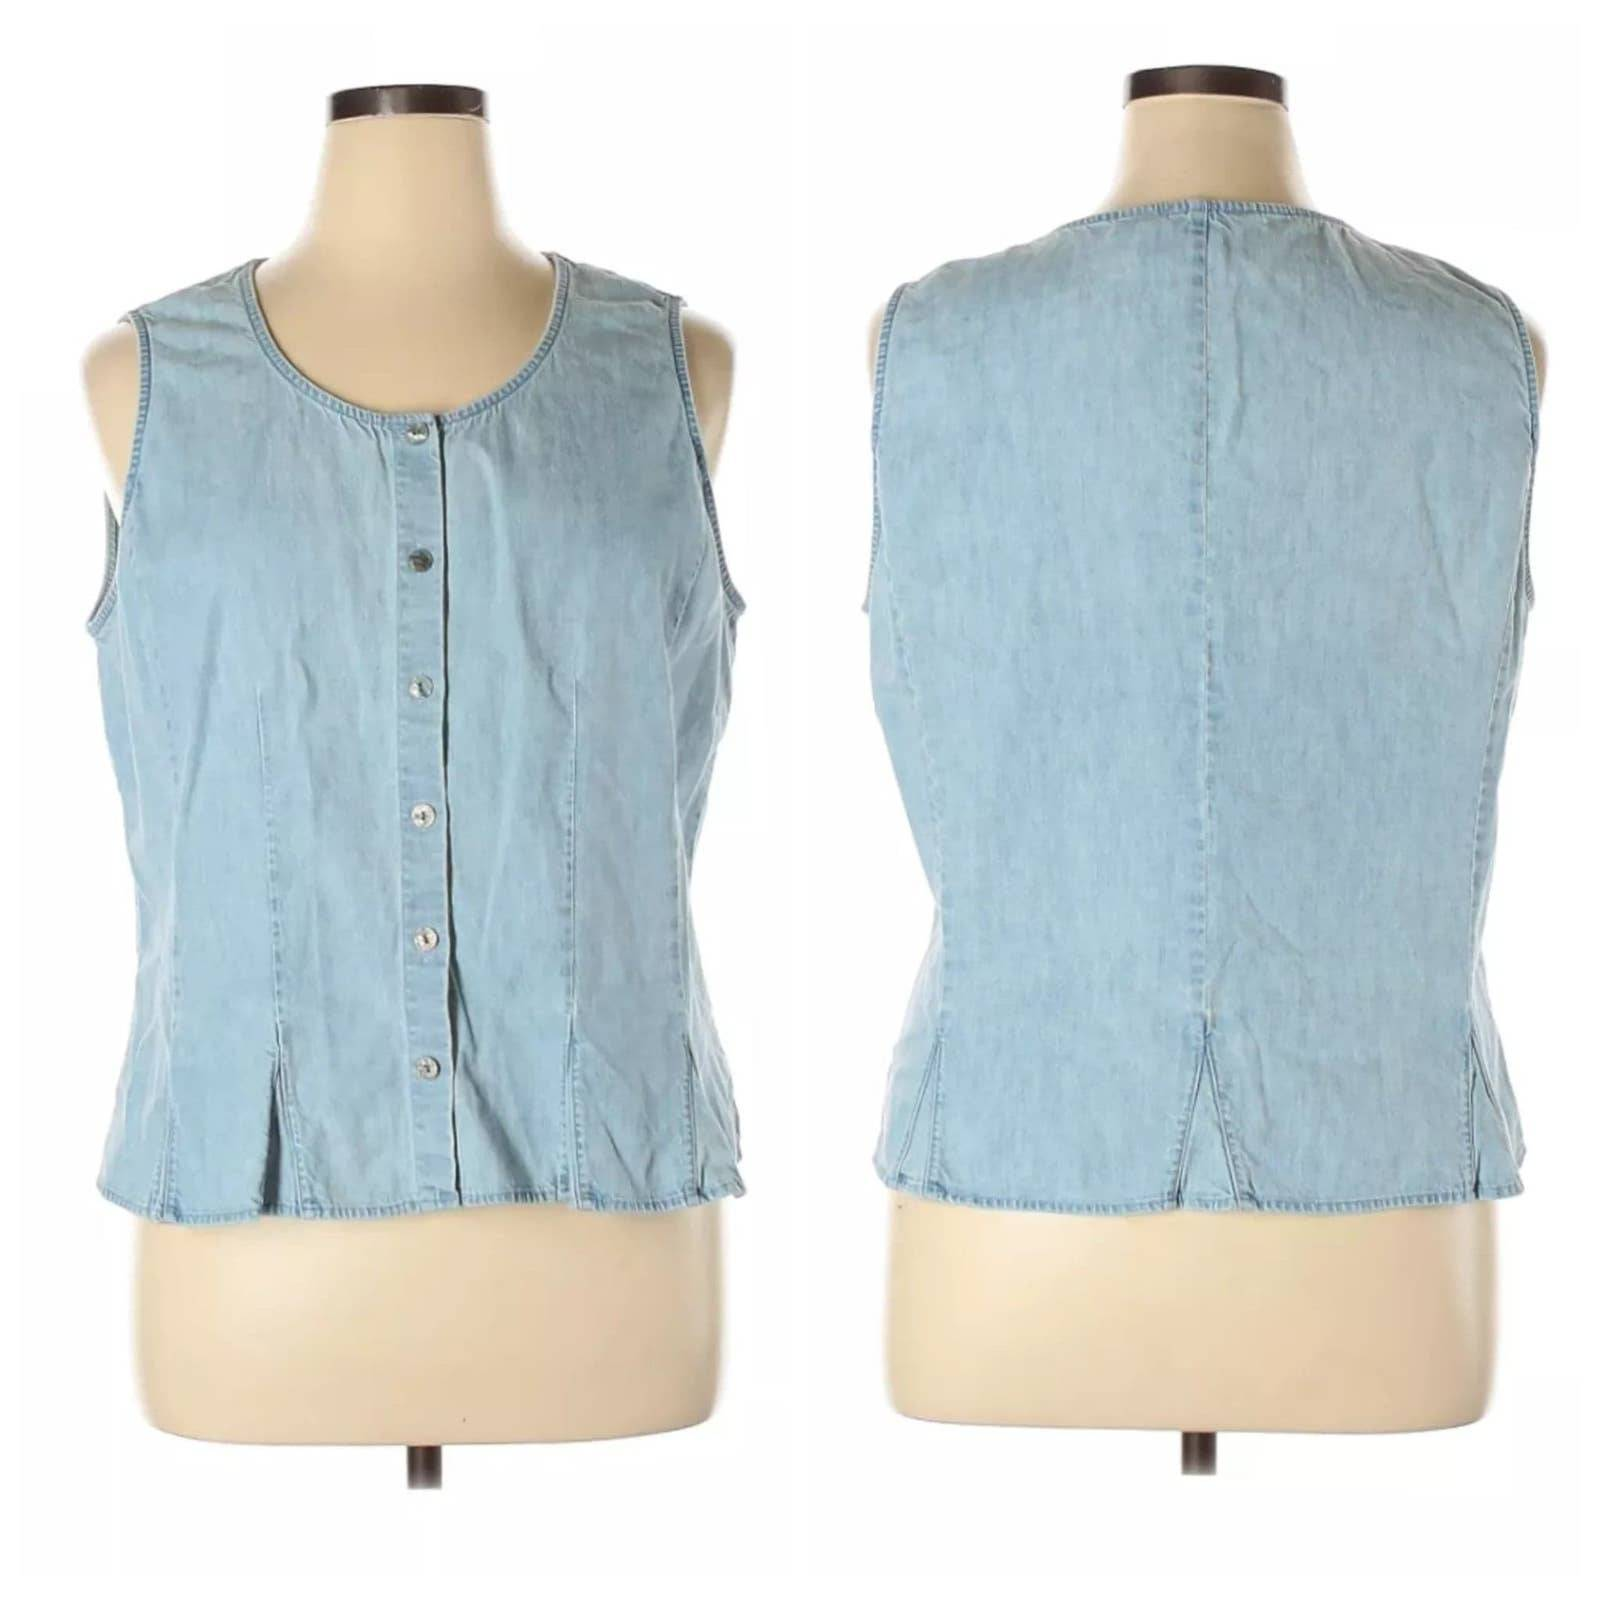 J Jill Button Up Chambray Vest Sz XL